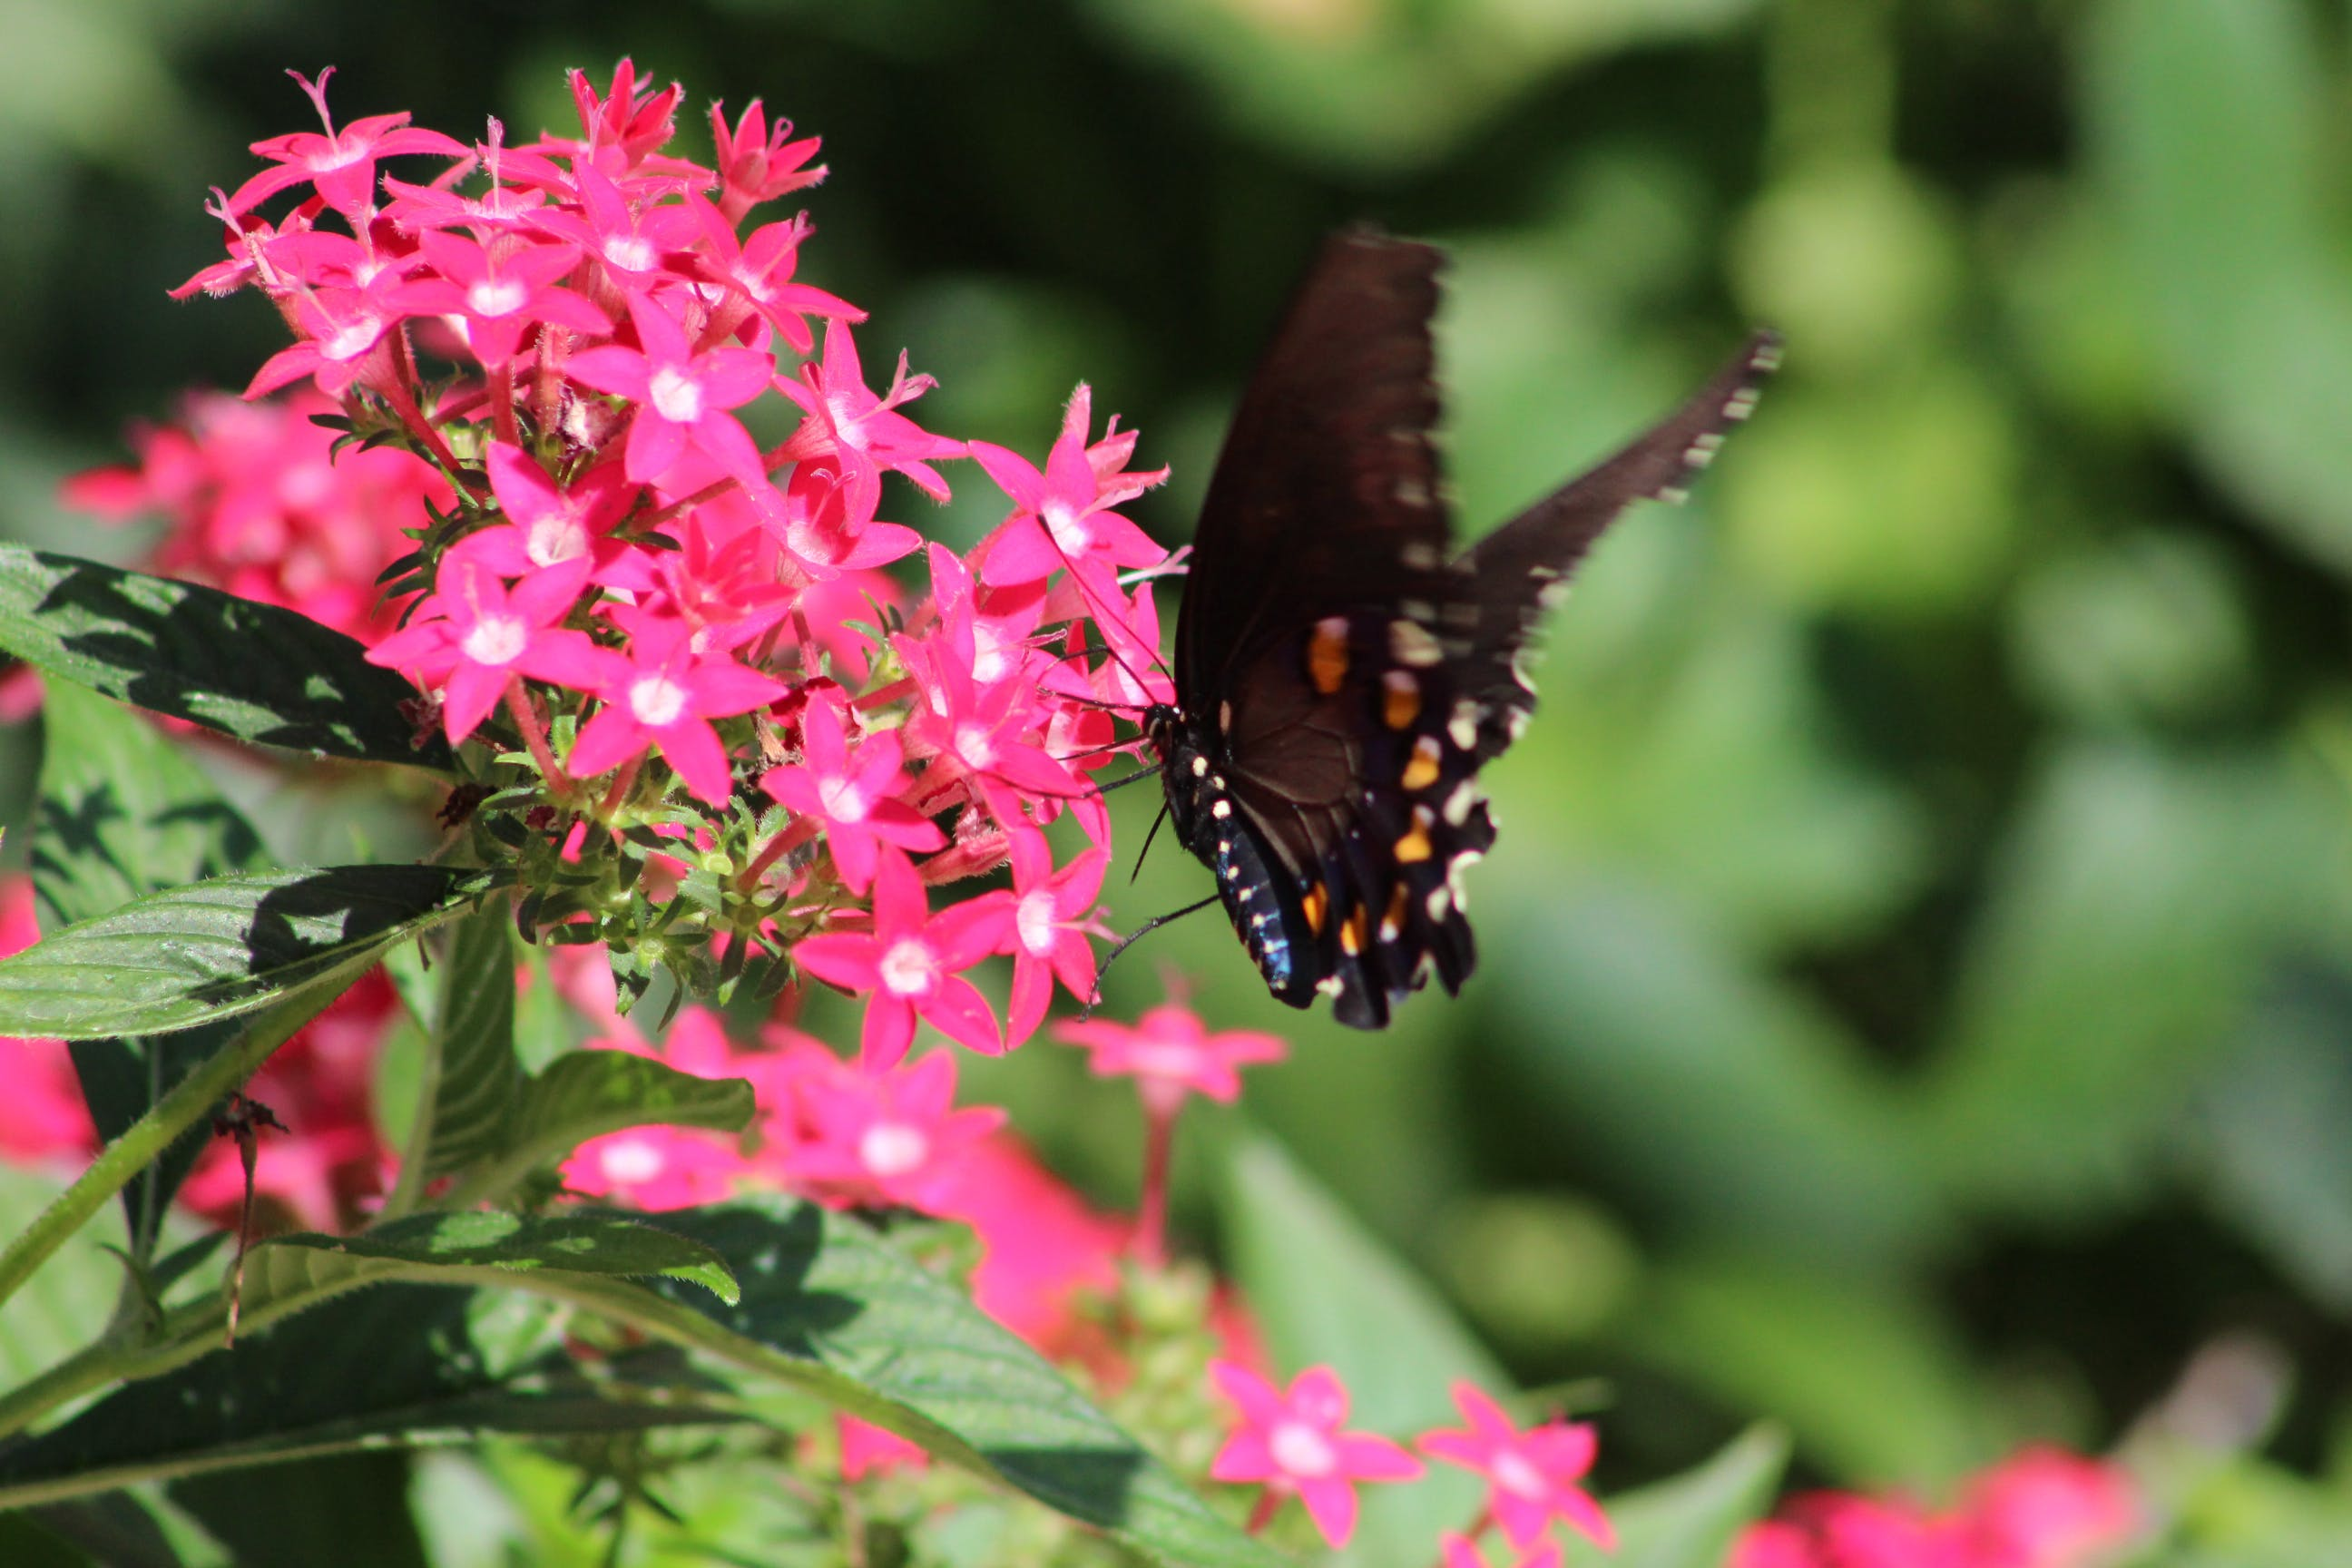 Free stock photo of bugs, butterflies, butterfly, butterfly on a flower